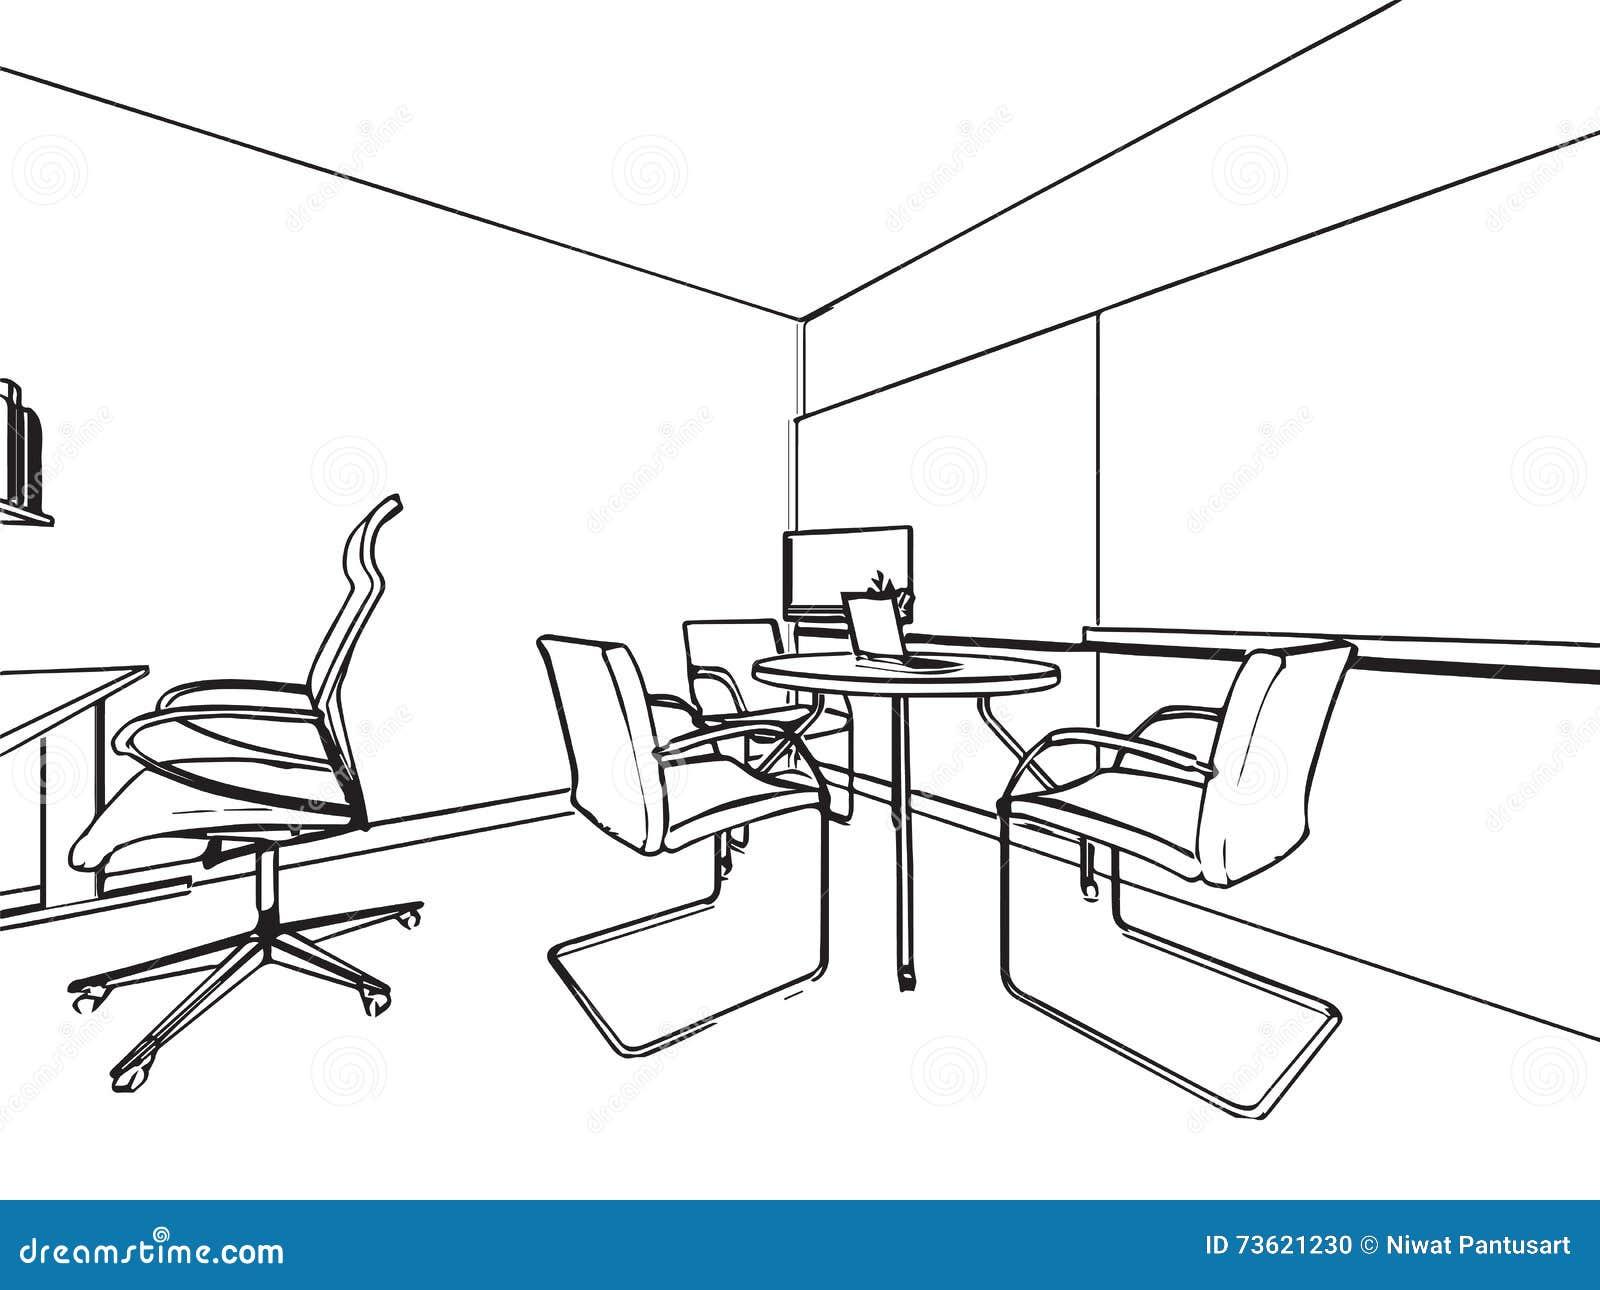 Perspectiva Interior Del Dibujo De Bosquejo Del Esquema De Una